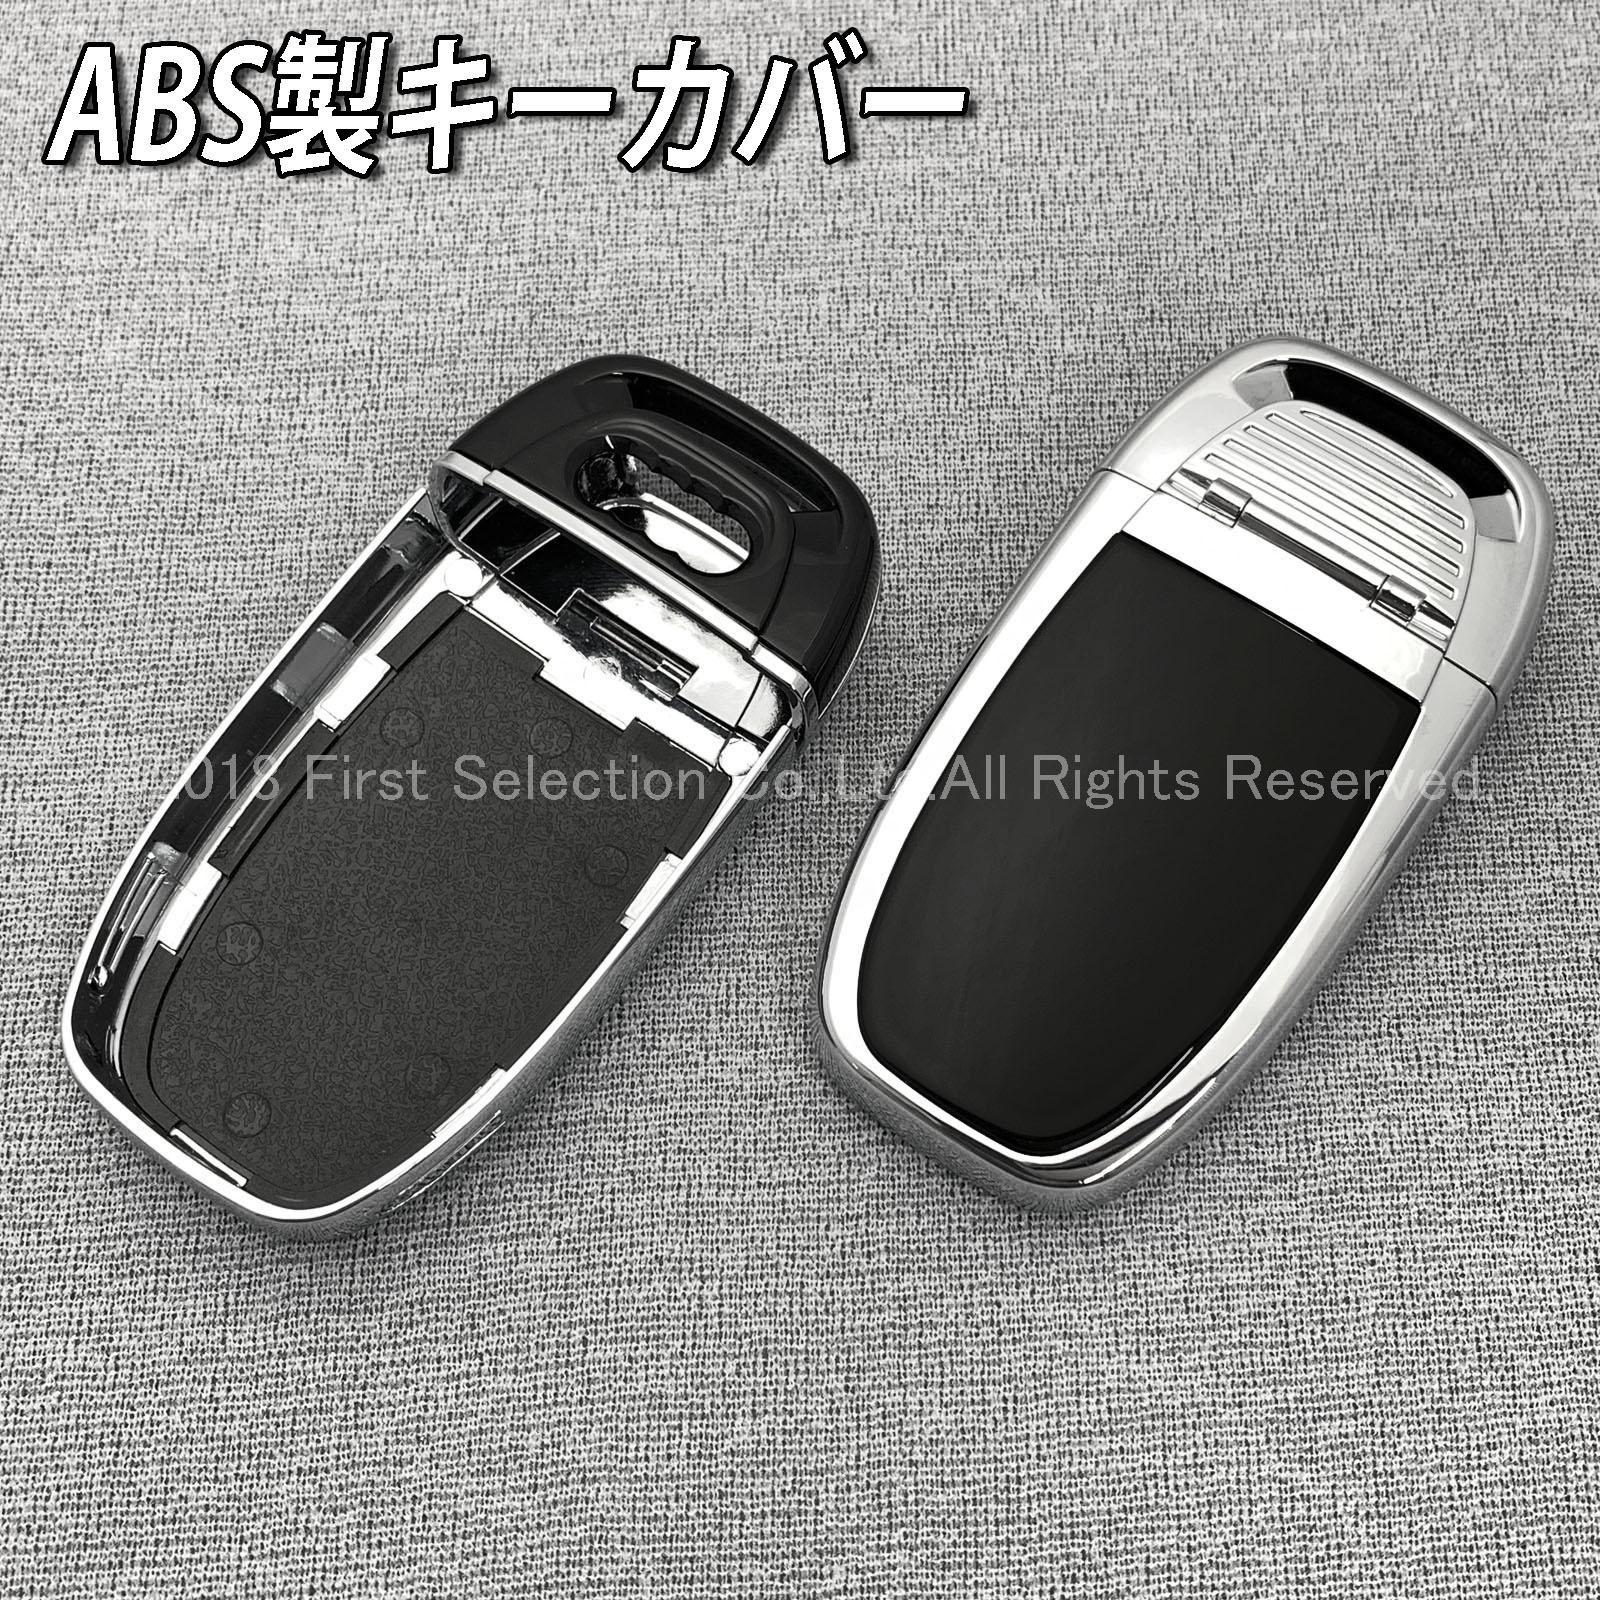 Audi アウディ スマートキー用 高品質キーカバー 黒 A4 A5 A6 A7 A8 S4 S5 S6 S7 S8 RS4 RS5 RS6 RS7 Q5 Q7 SQ5